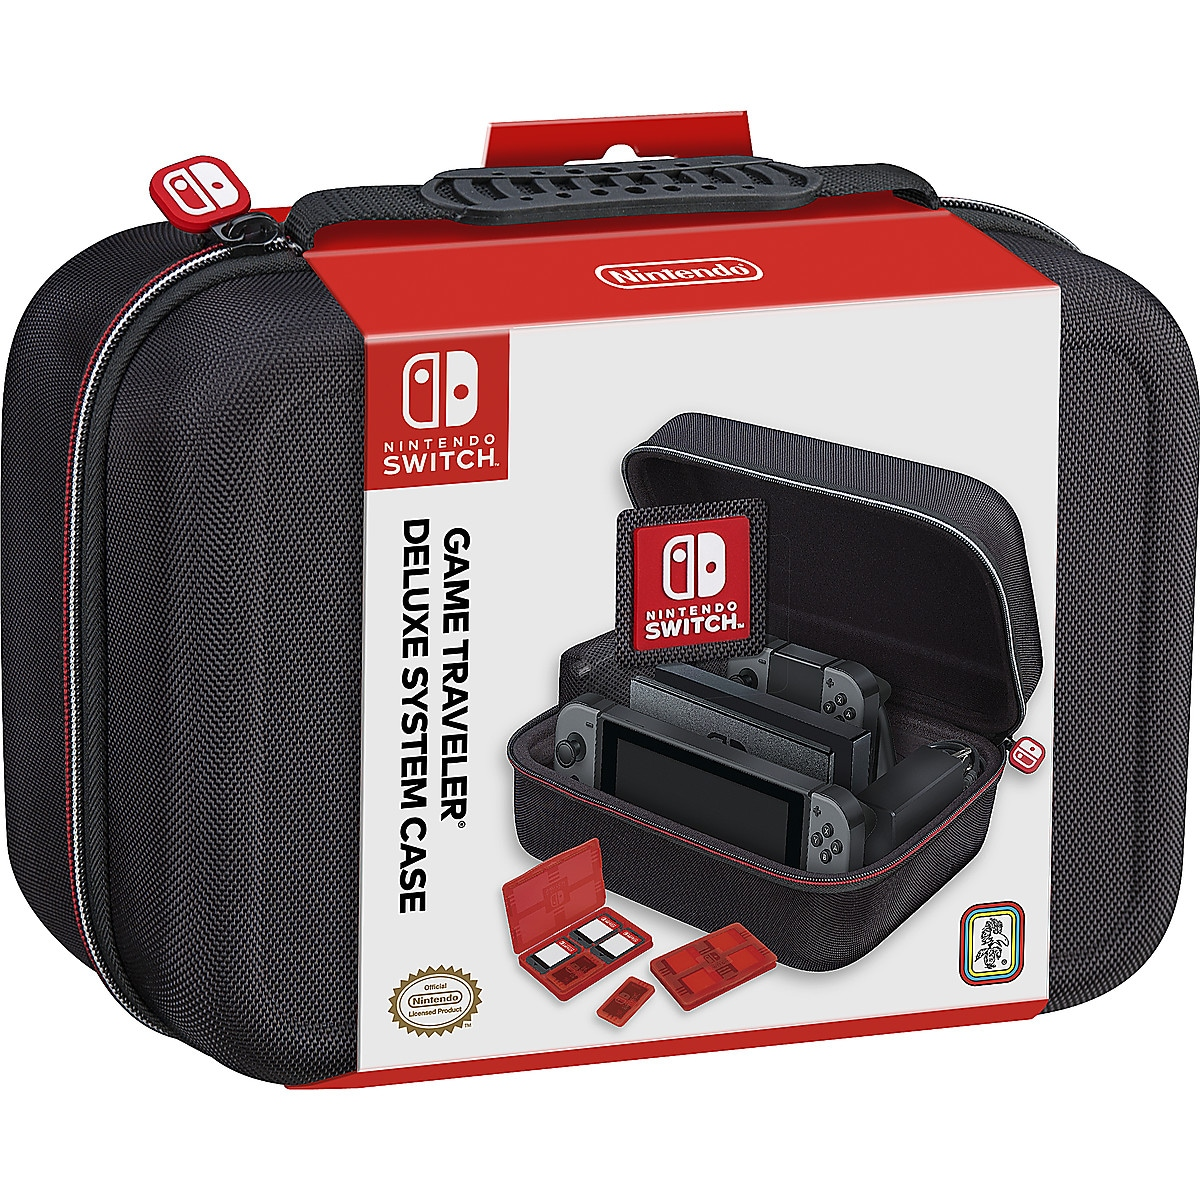 Nintendo Switch Complete Deluxe Travel Case